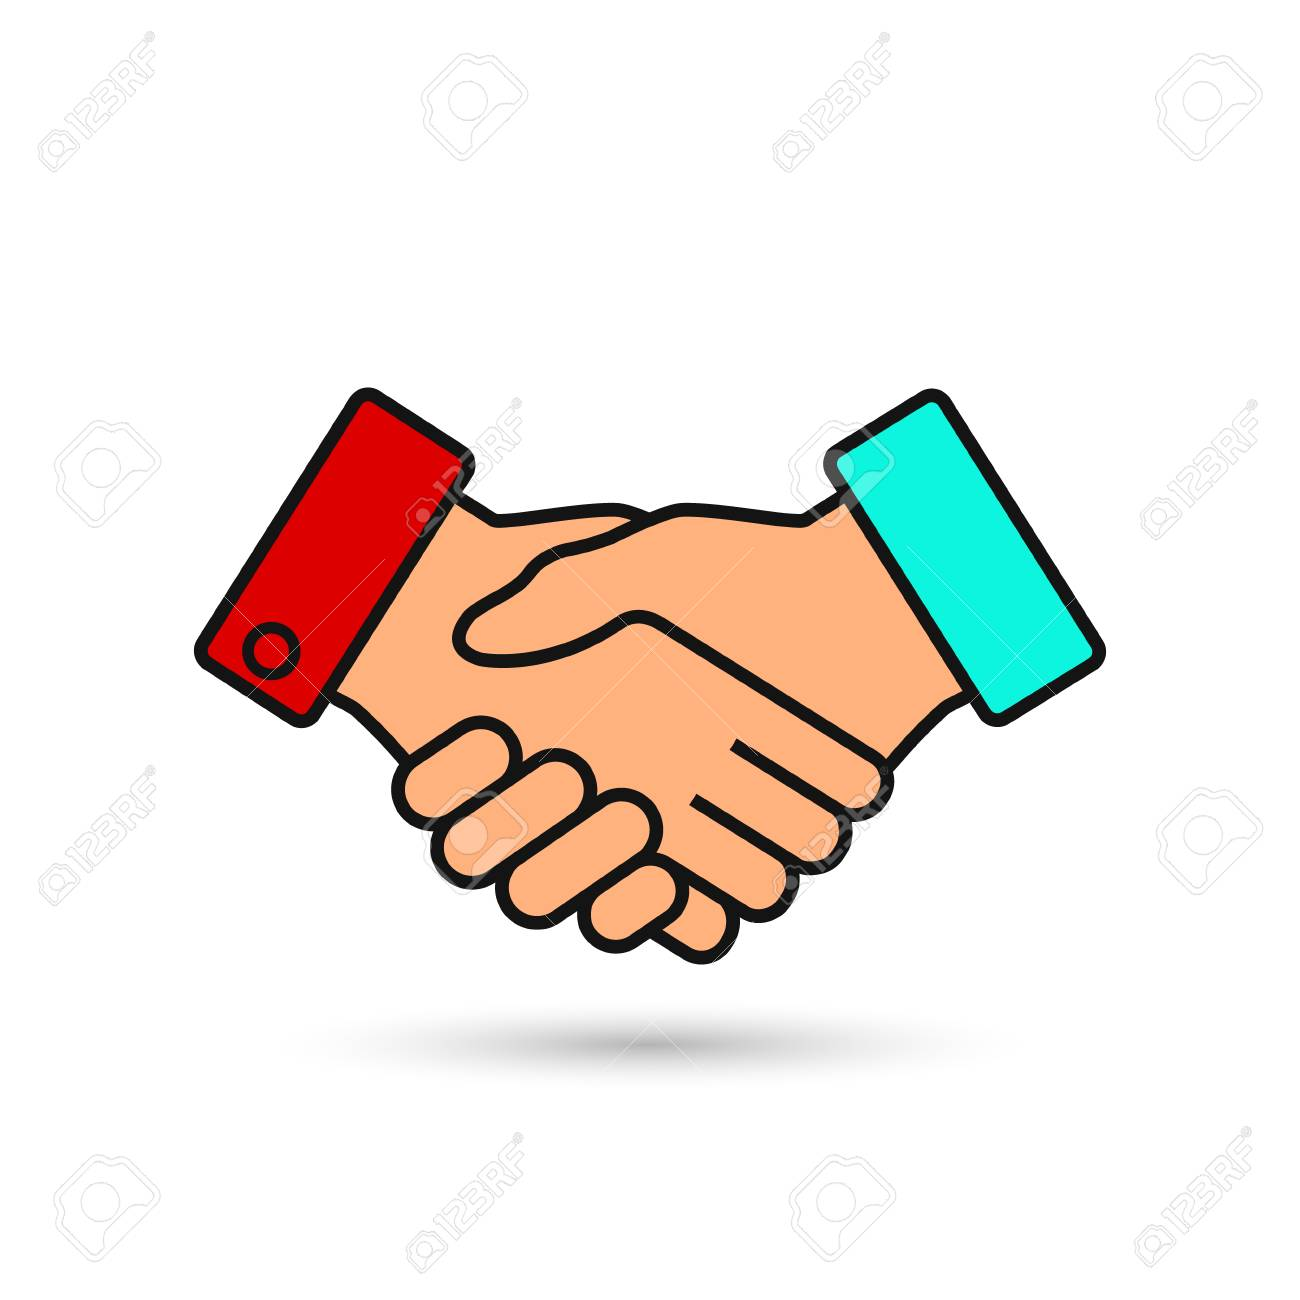 handshake business vector illustration symbol of success deal rh 123rf com handshake vector illustration handshake vector image